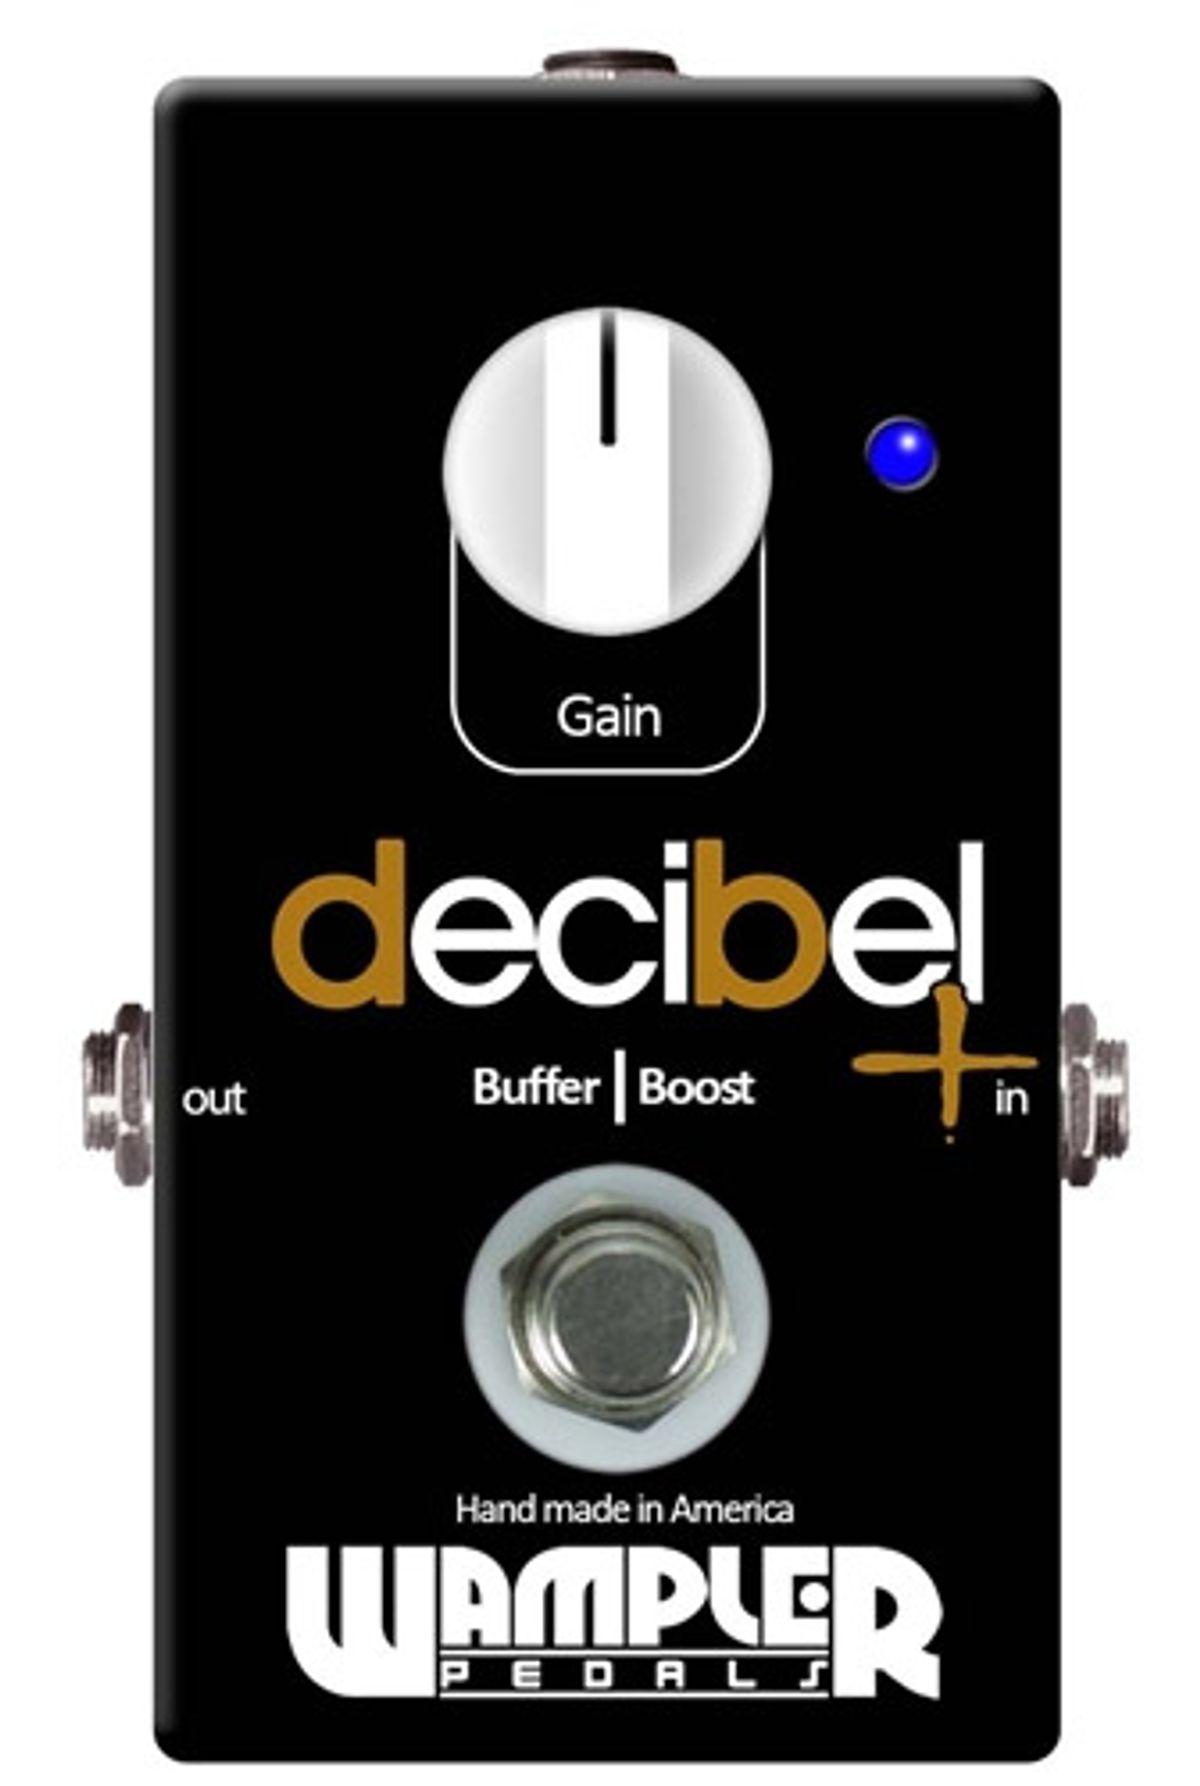 Wampler Pedals Releases the Decibel+ Buffer/Boost